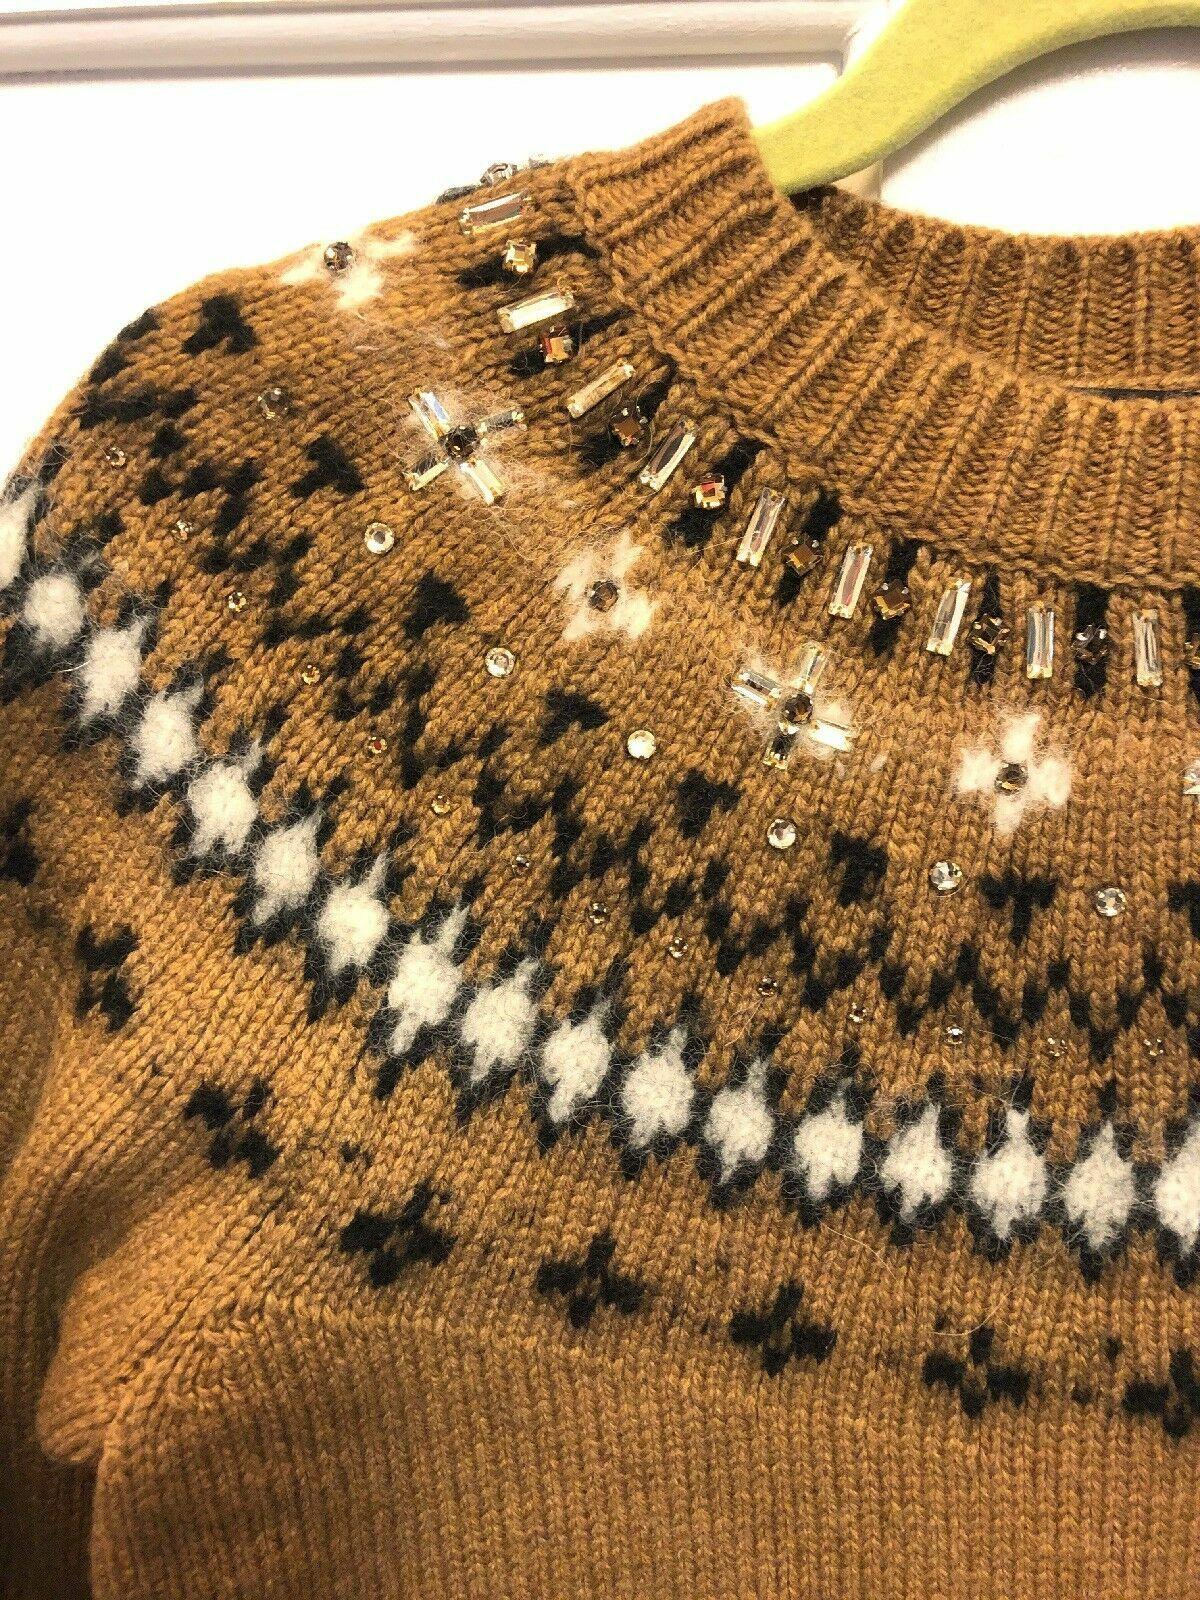 NEW J CREW Womens Jewel Embellish Embellish Embellish Fair Isle Sweater Dress Camel Grey XS S  148 c2851a